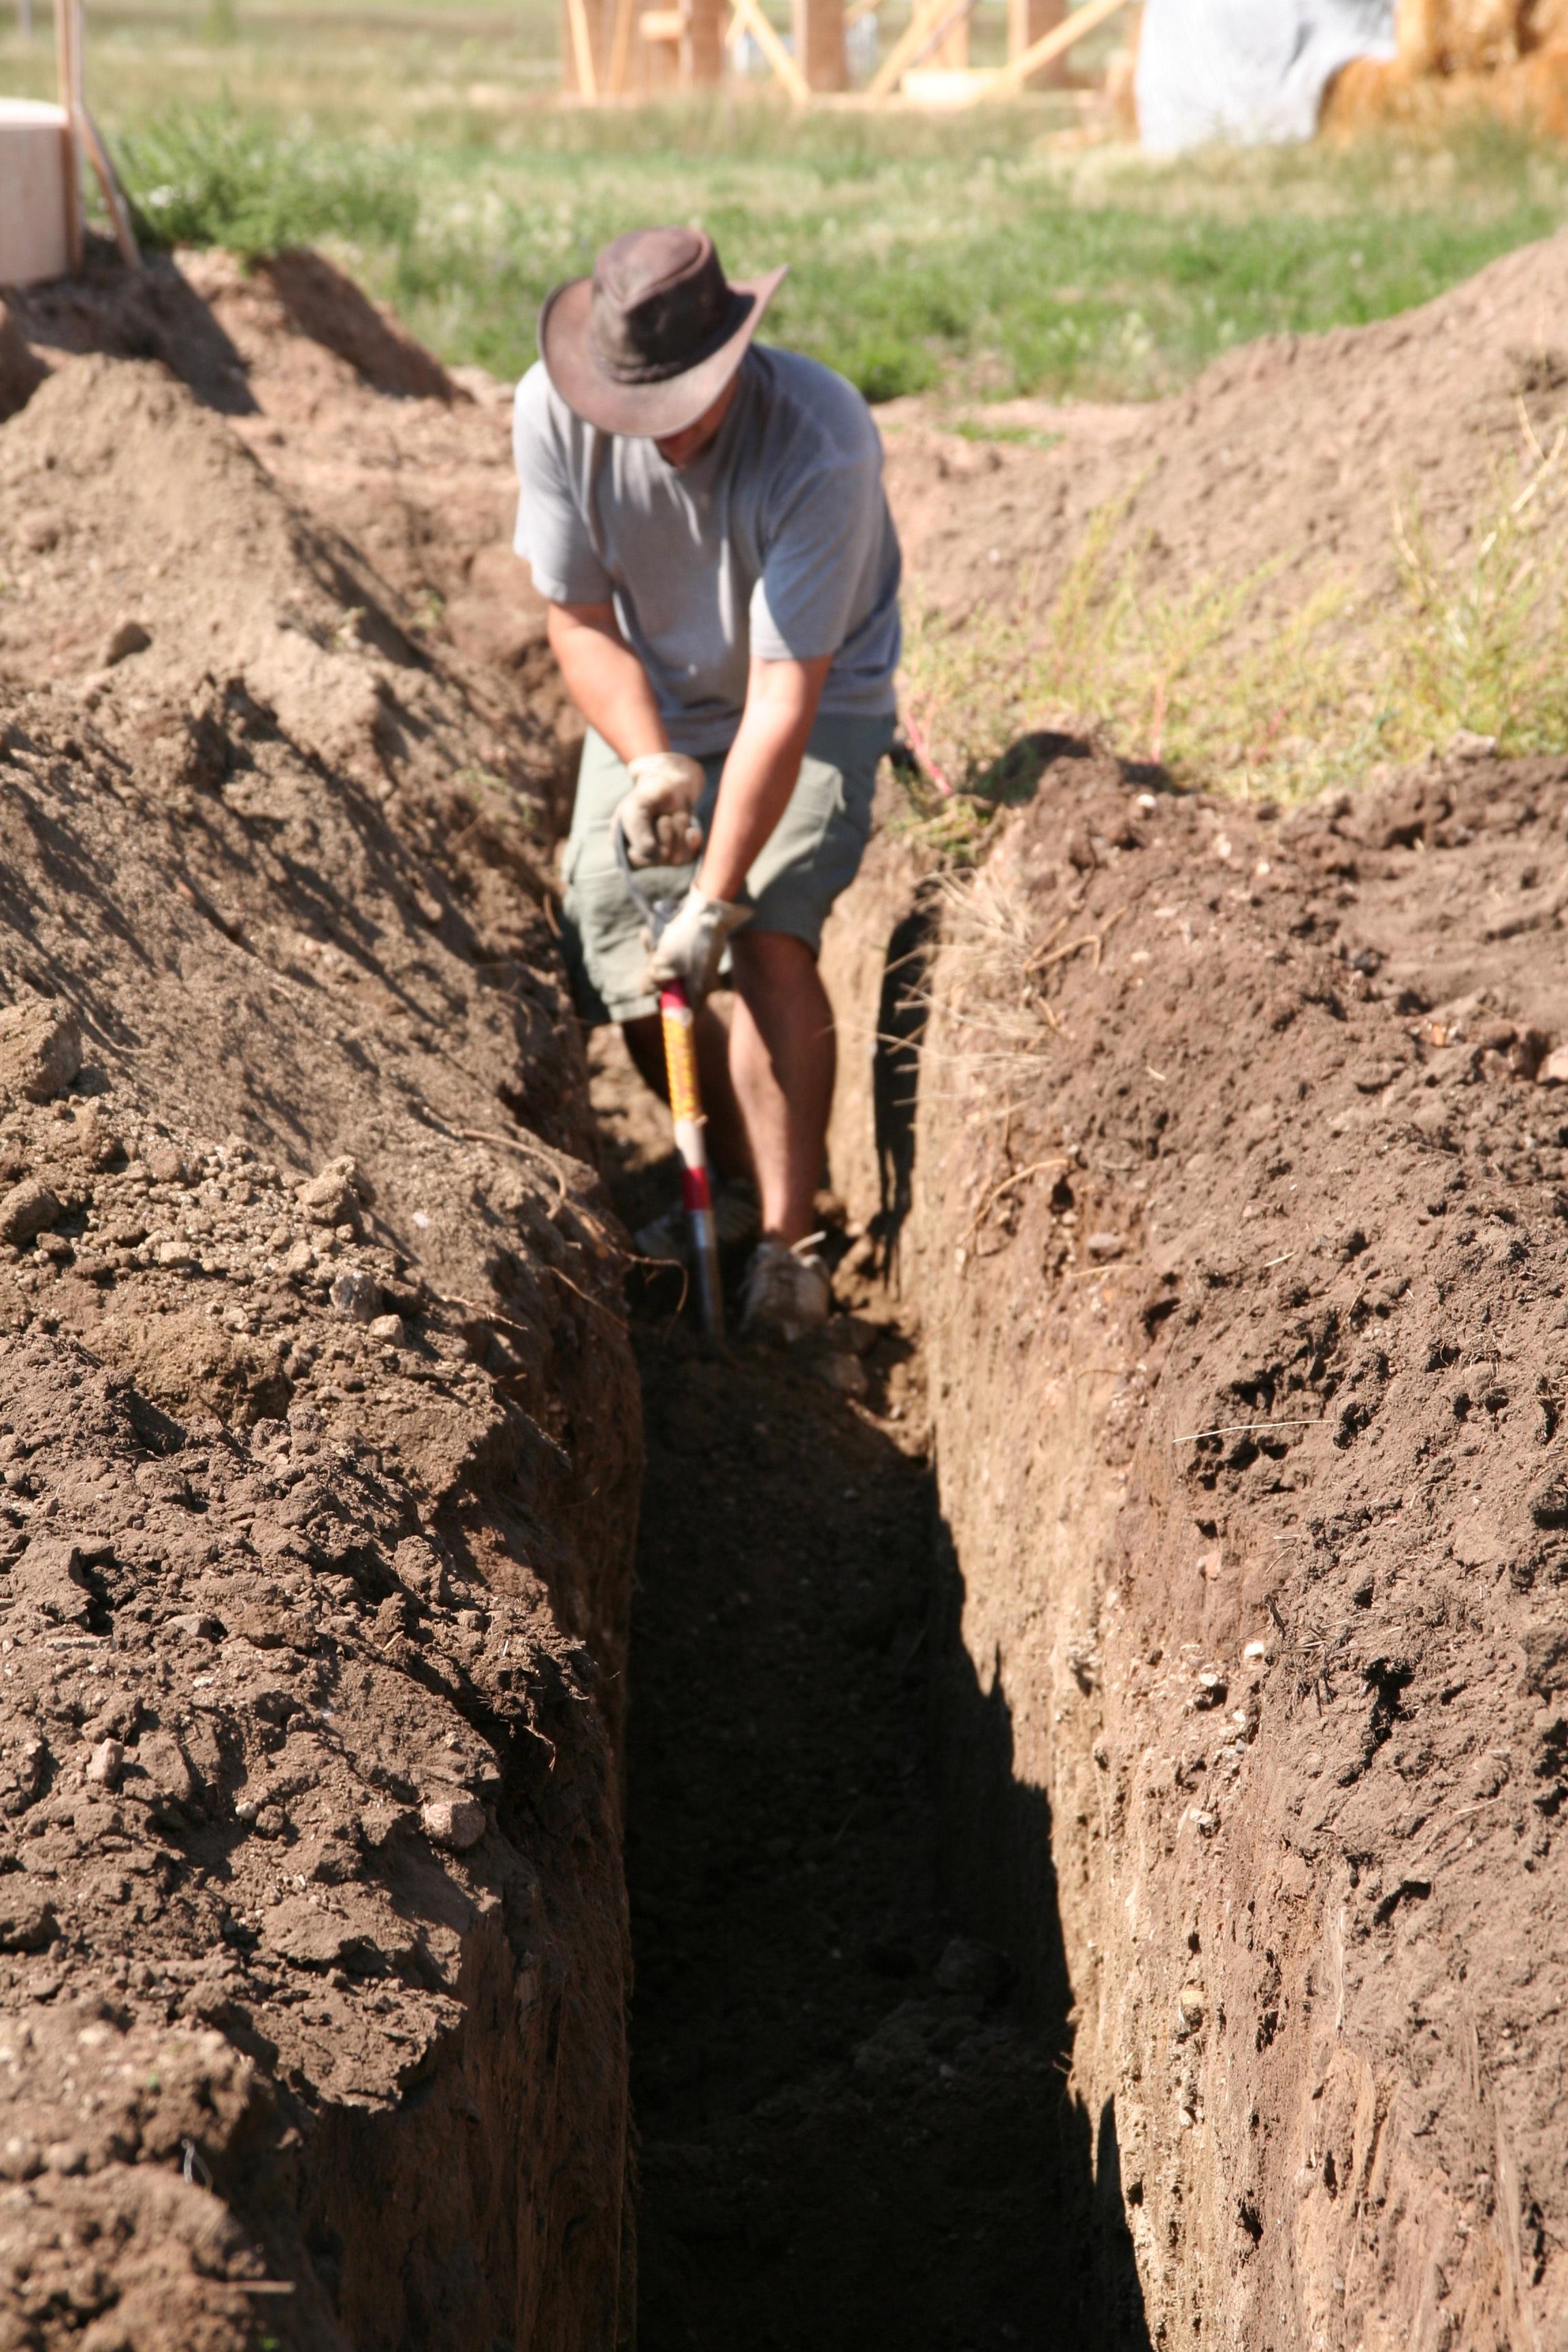 images gratuites travail homme sol pose g ologie tuyau creusement pelle creuser. Black Bedroom Furniture Sets. Home Design Ideas